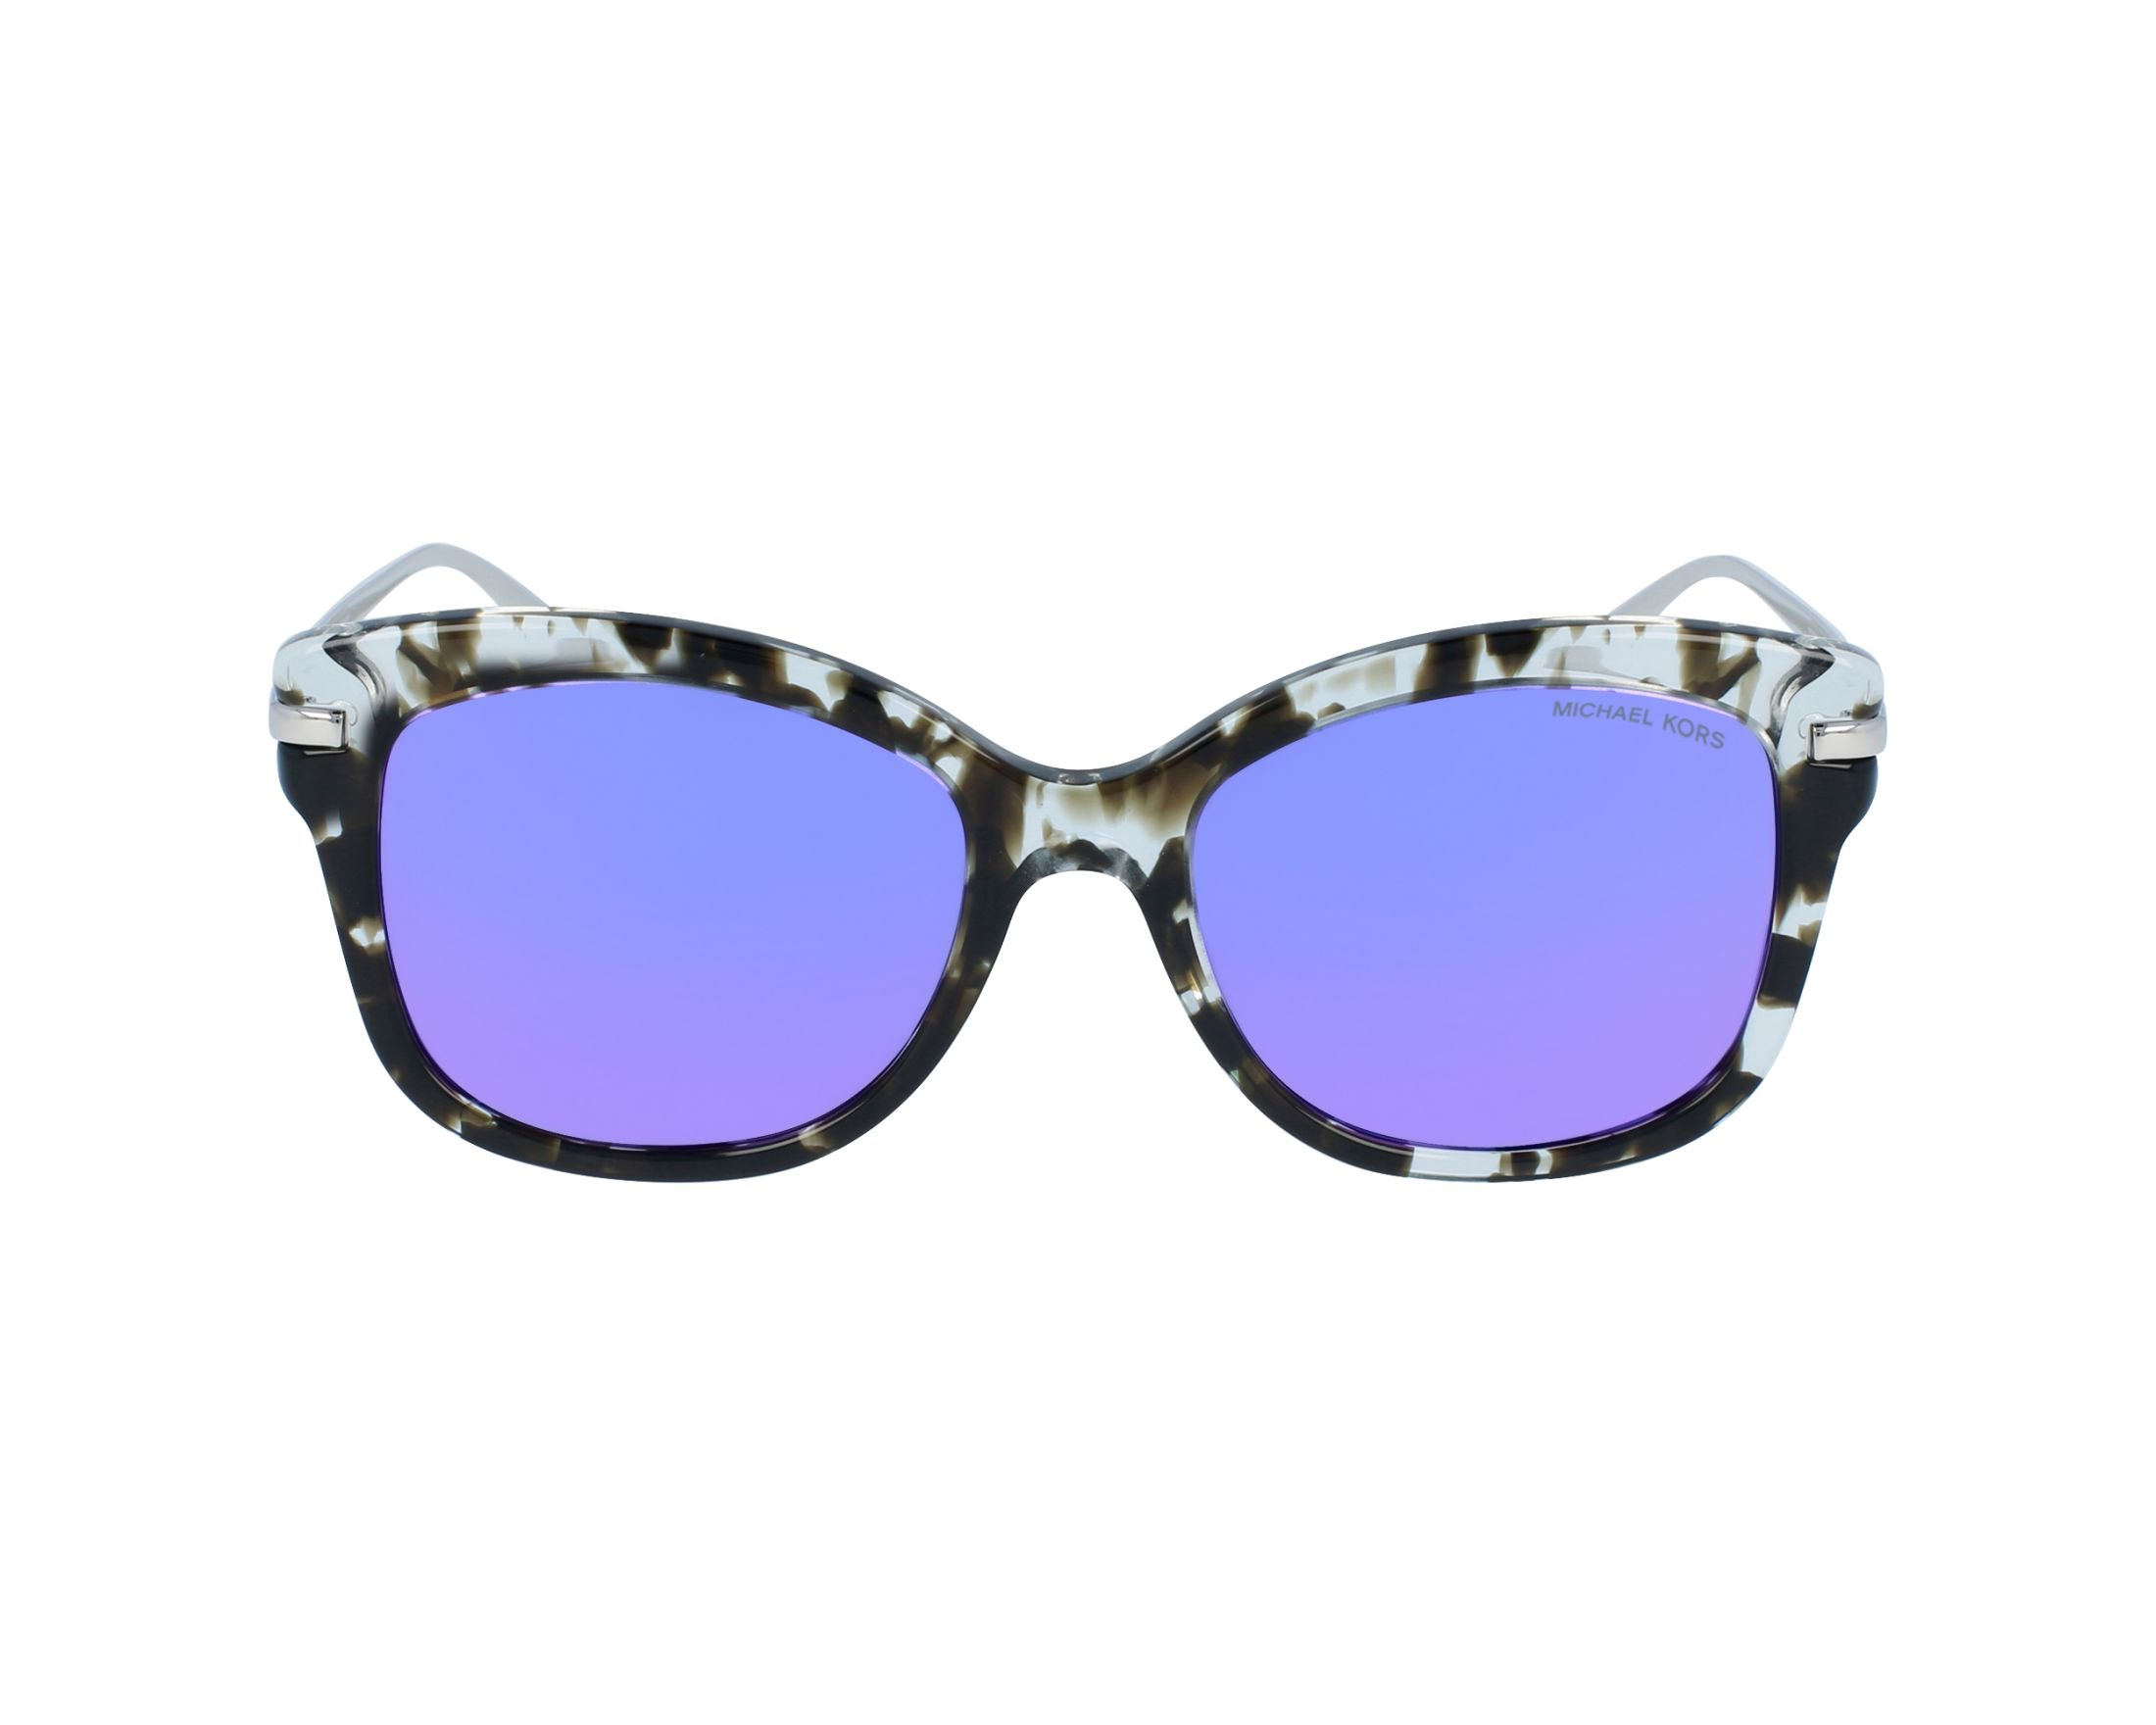 2bf33e4365 Sunglasses Michael Kors MK-2047 32434V 53-18 Crystal Silver profile view